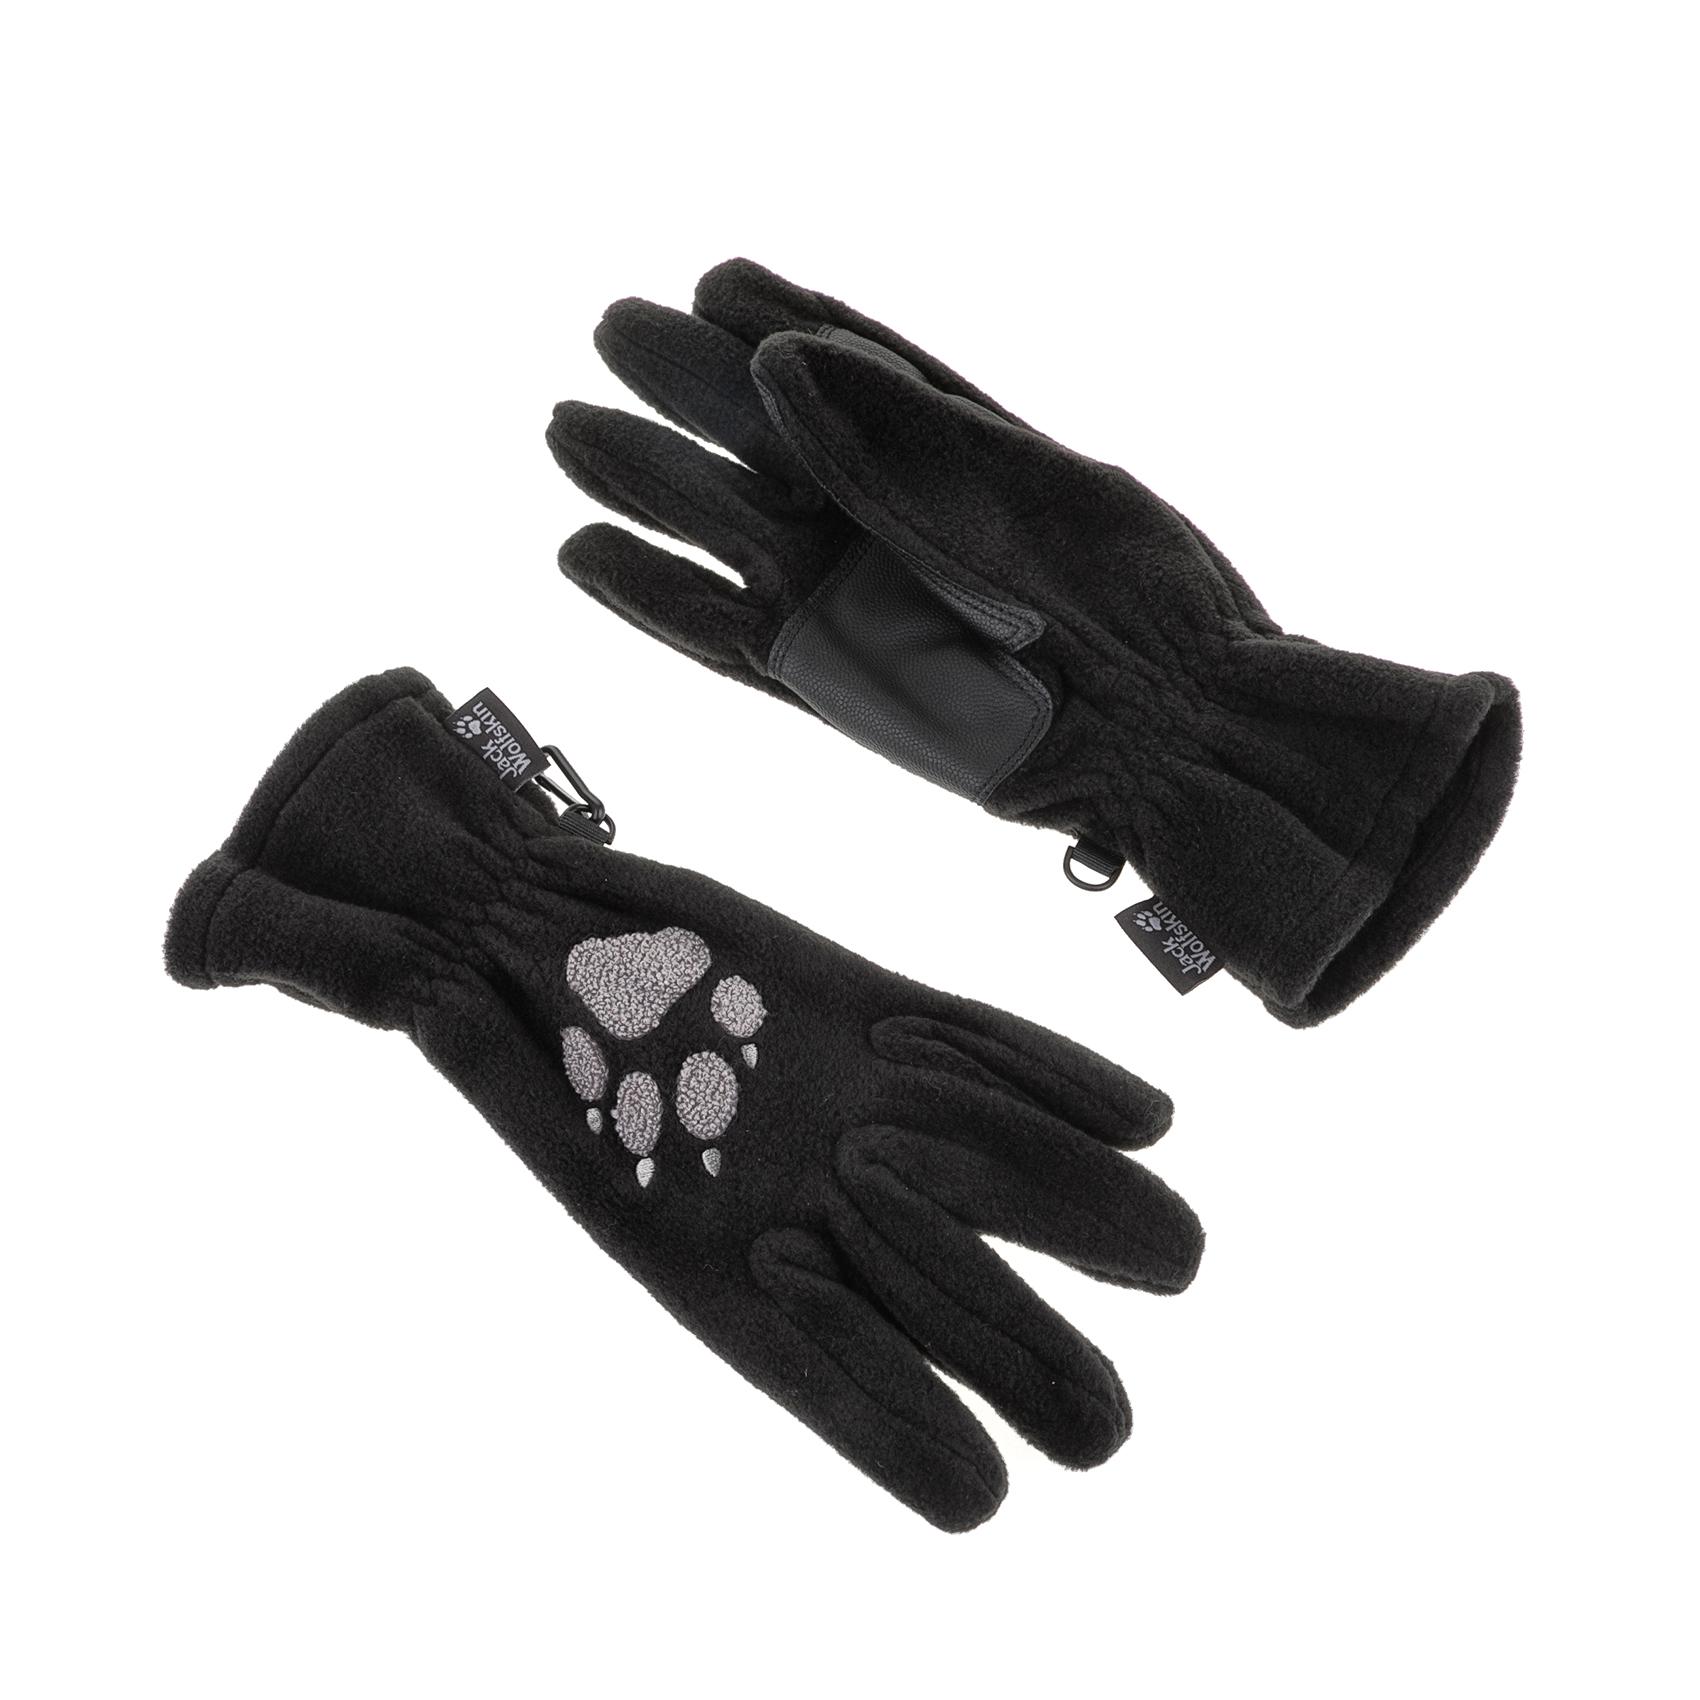 JACK WOLFSKIN - Unisex γάντια PAW GLOVES μαύρα γυναικεία αξεσουάρ φουλάρια κασκόλ γάντια